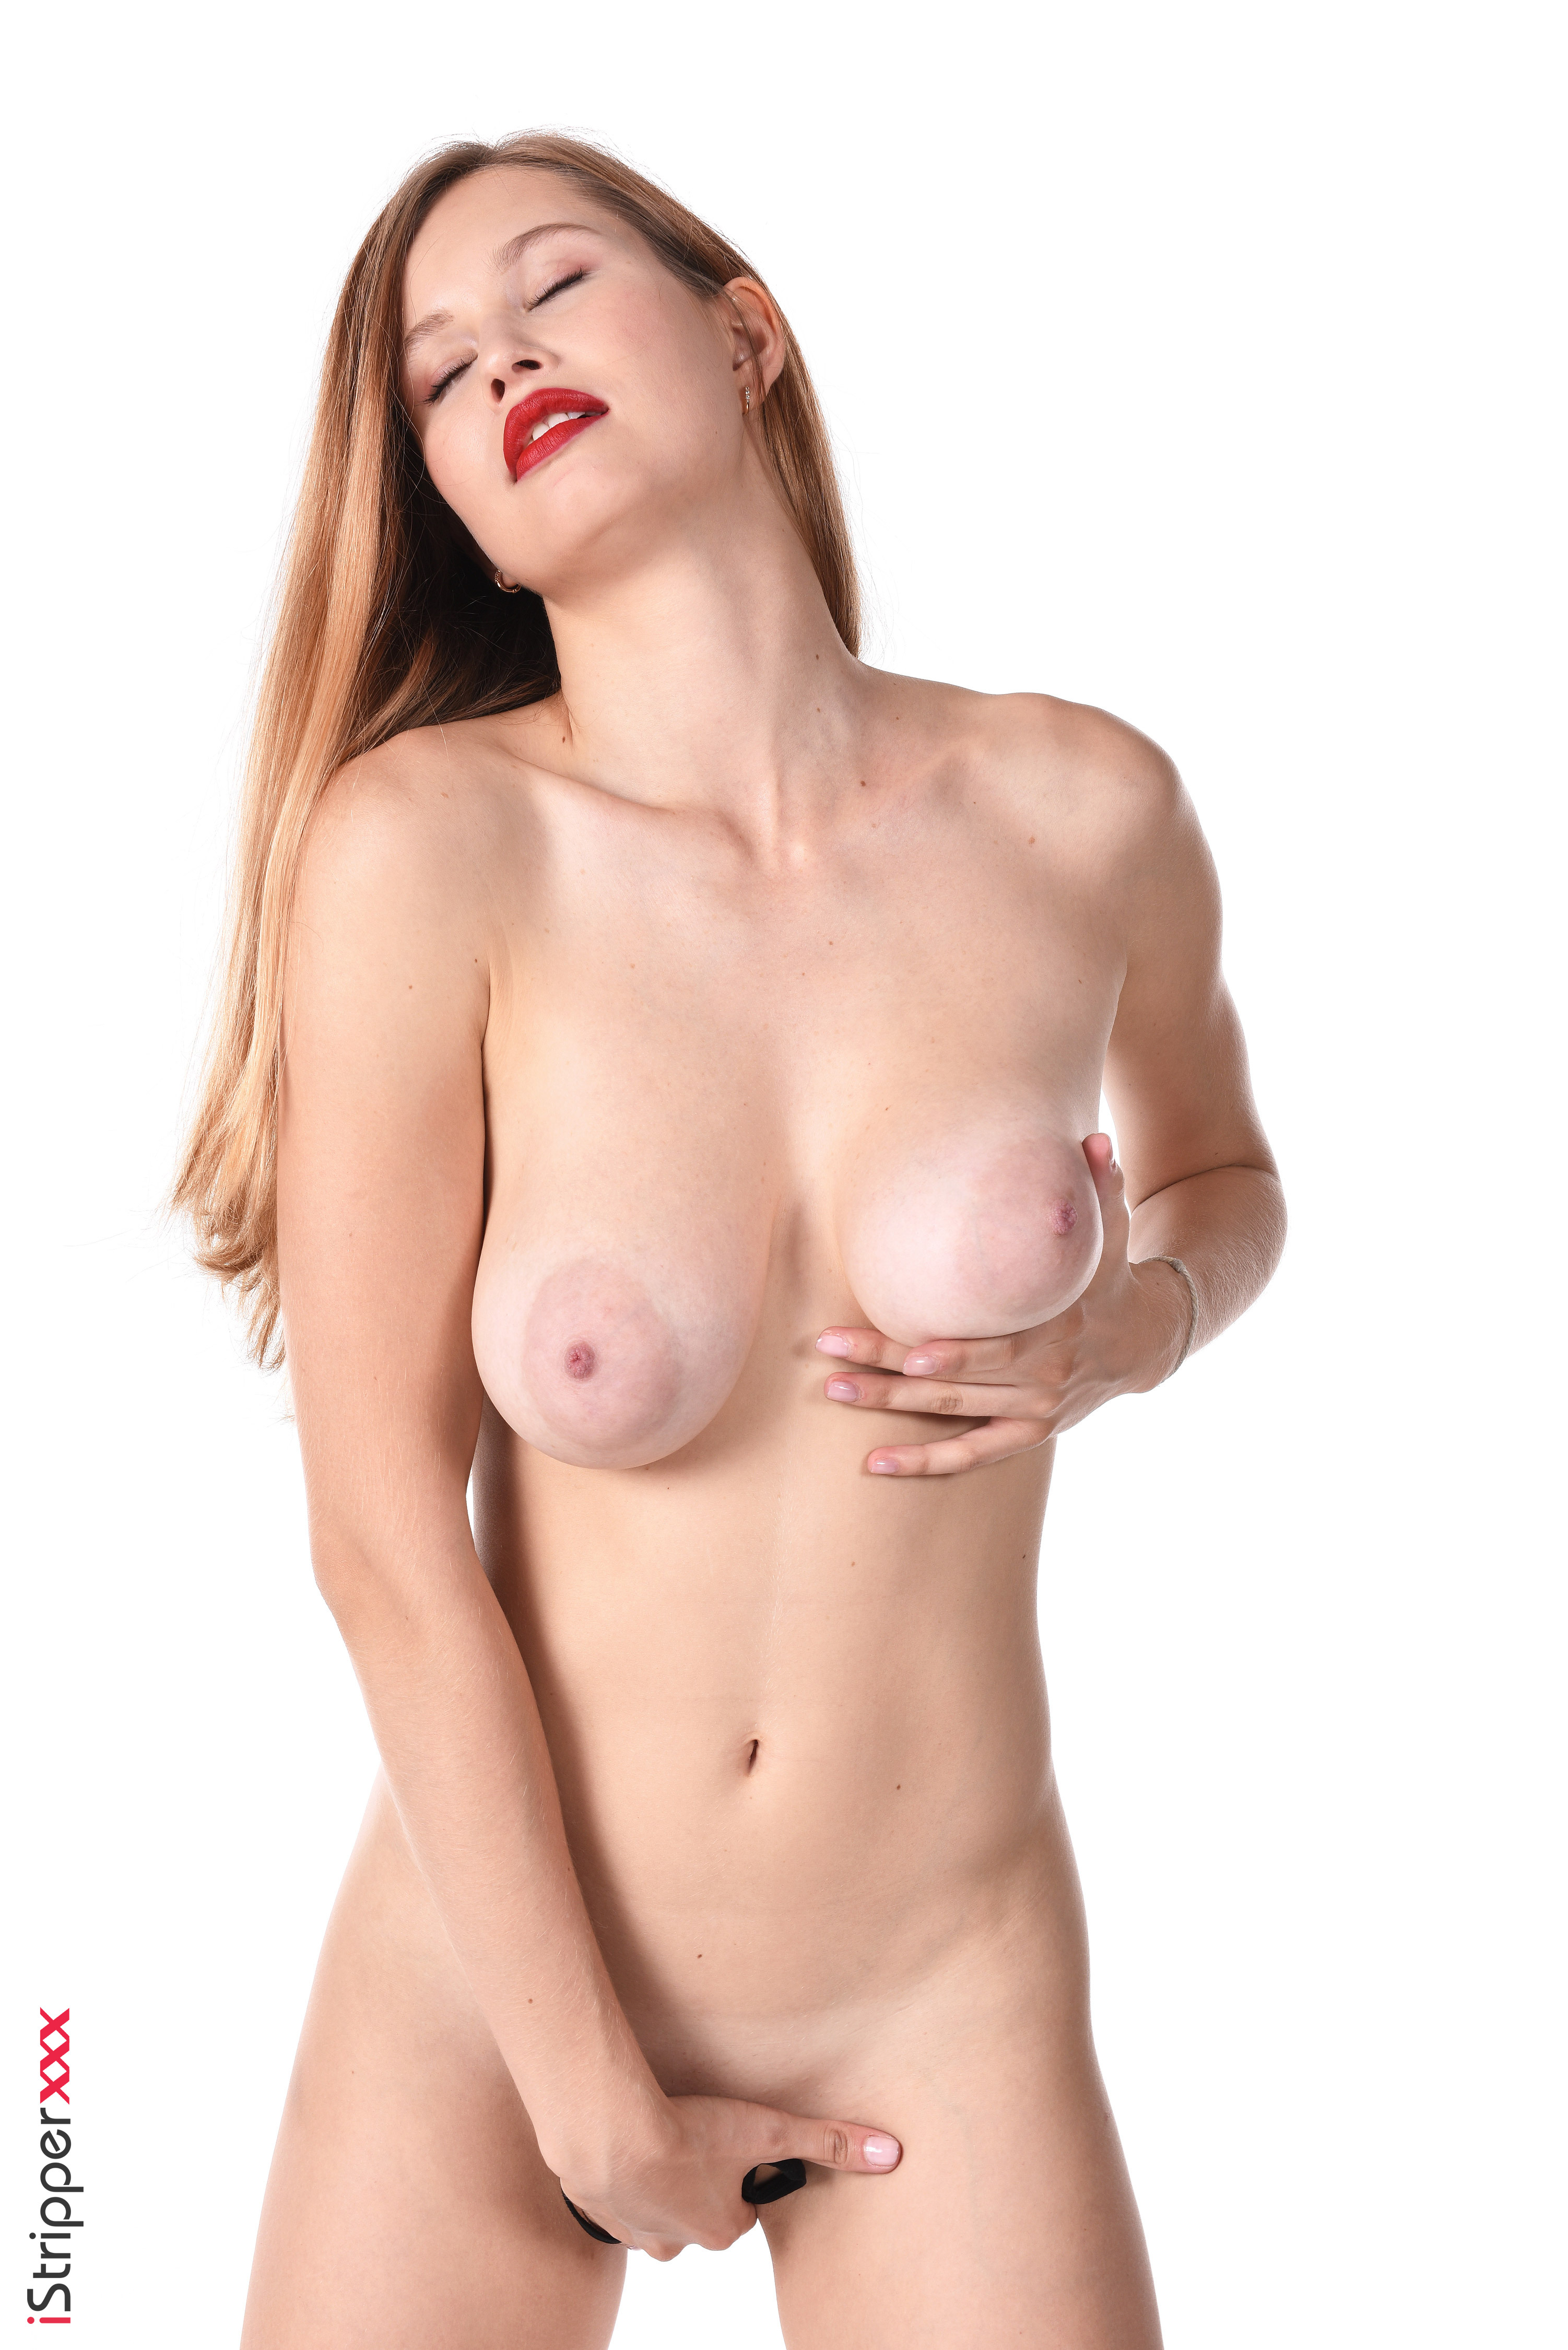 xvideos alix lynx virtual stripper